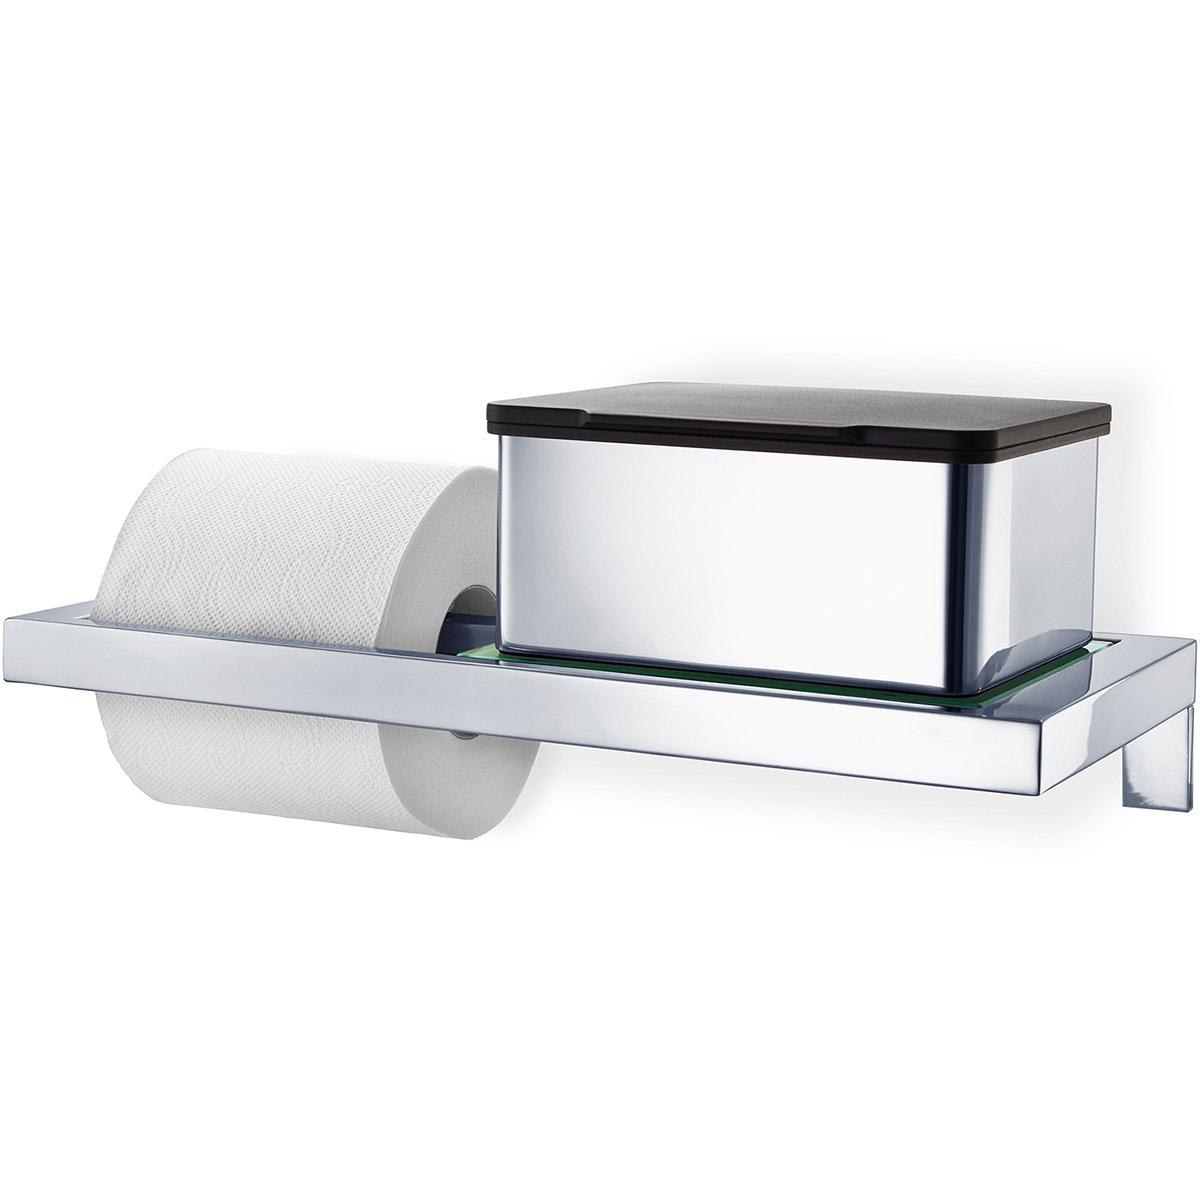 uchwyt na papier toaletowy ze szklan p k blomus menoto. Black Bedroom Furniture Sets. Home Design Ideas